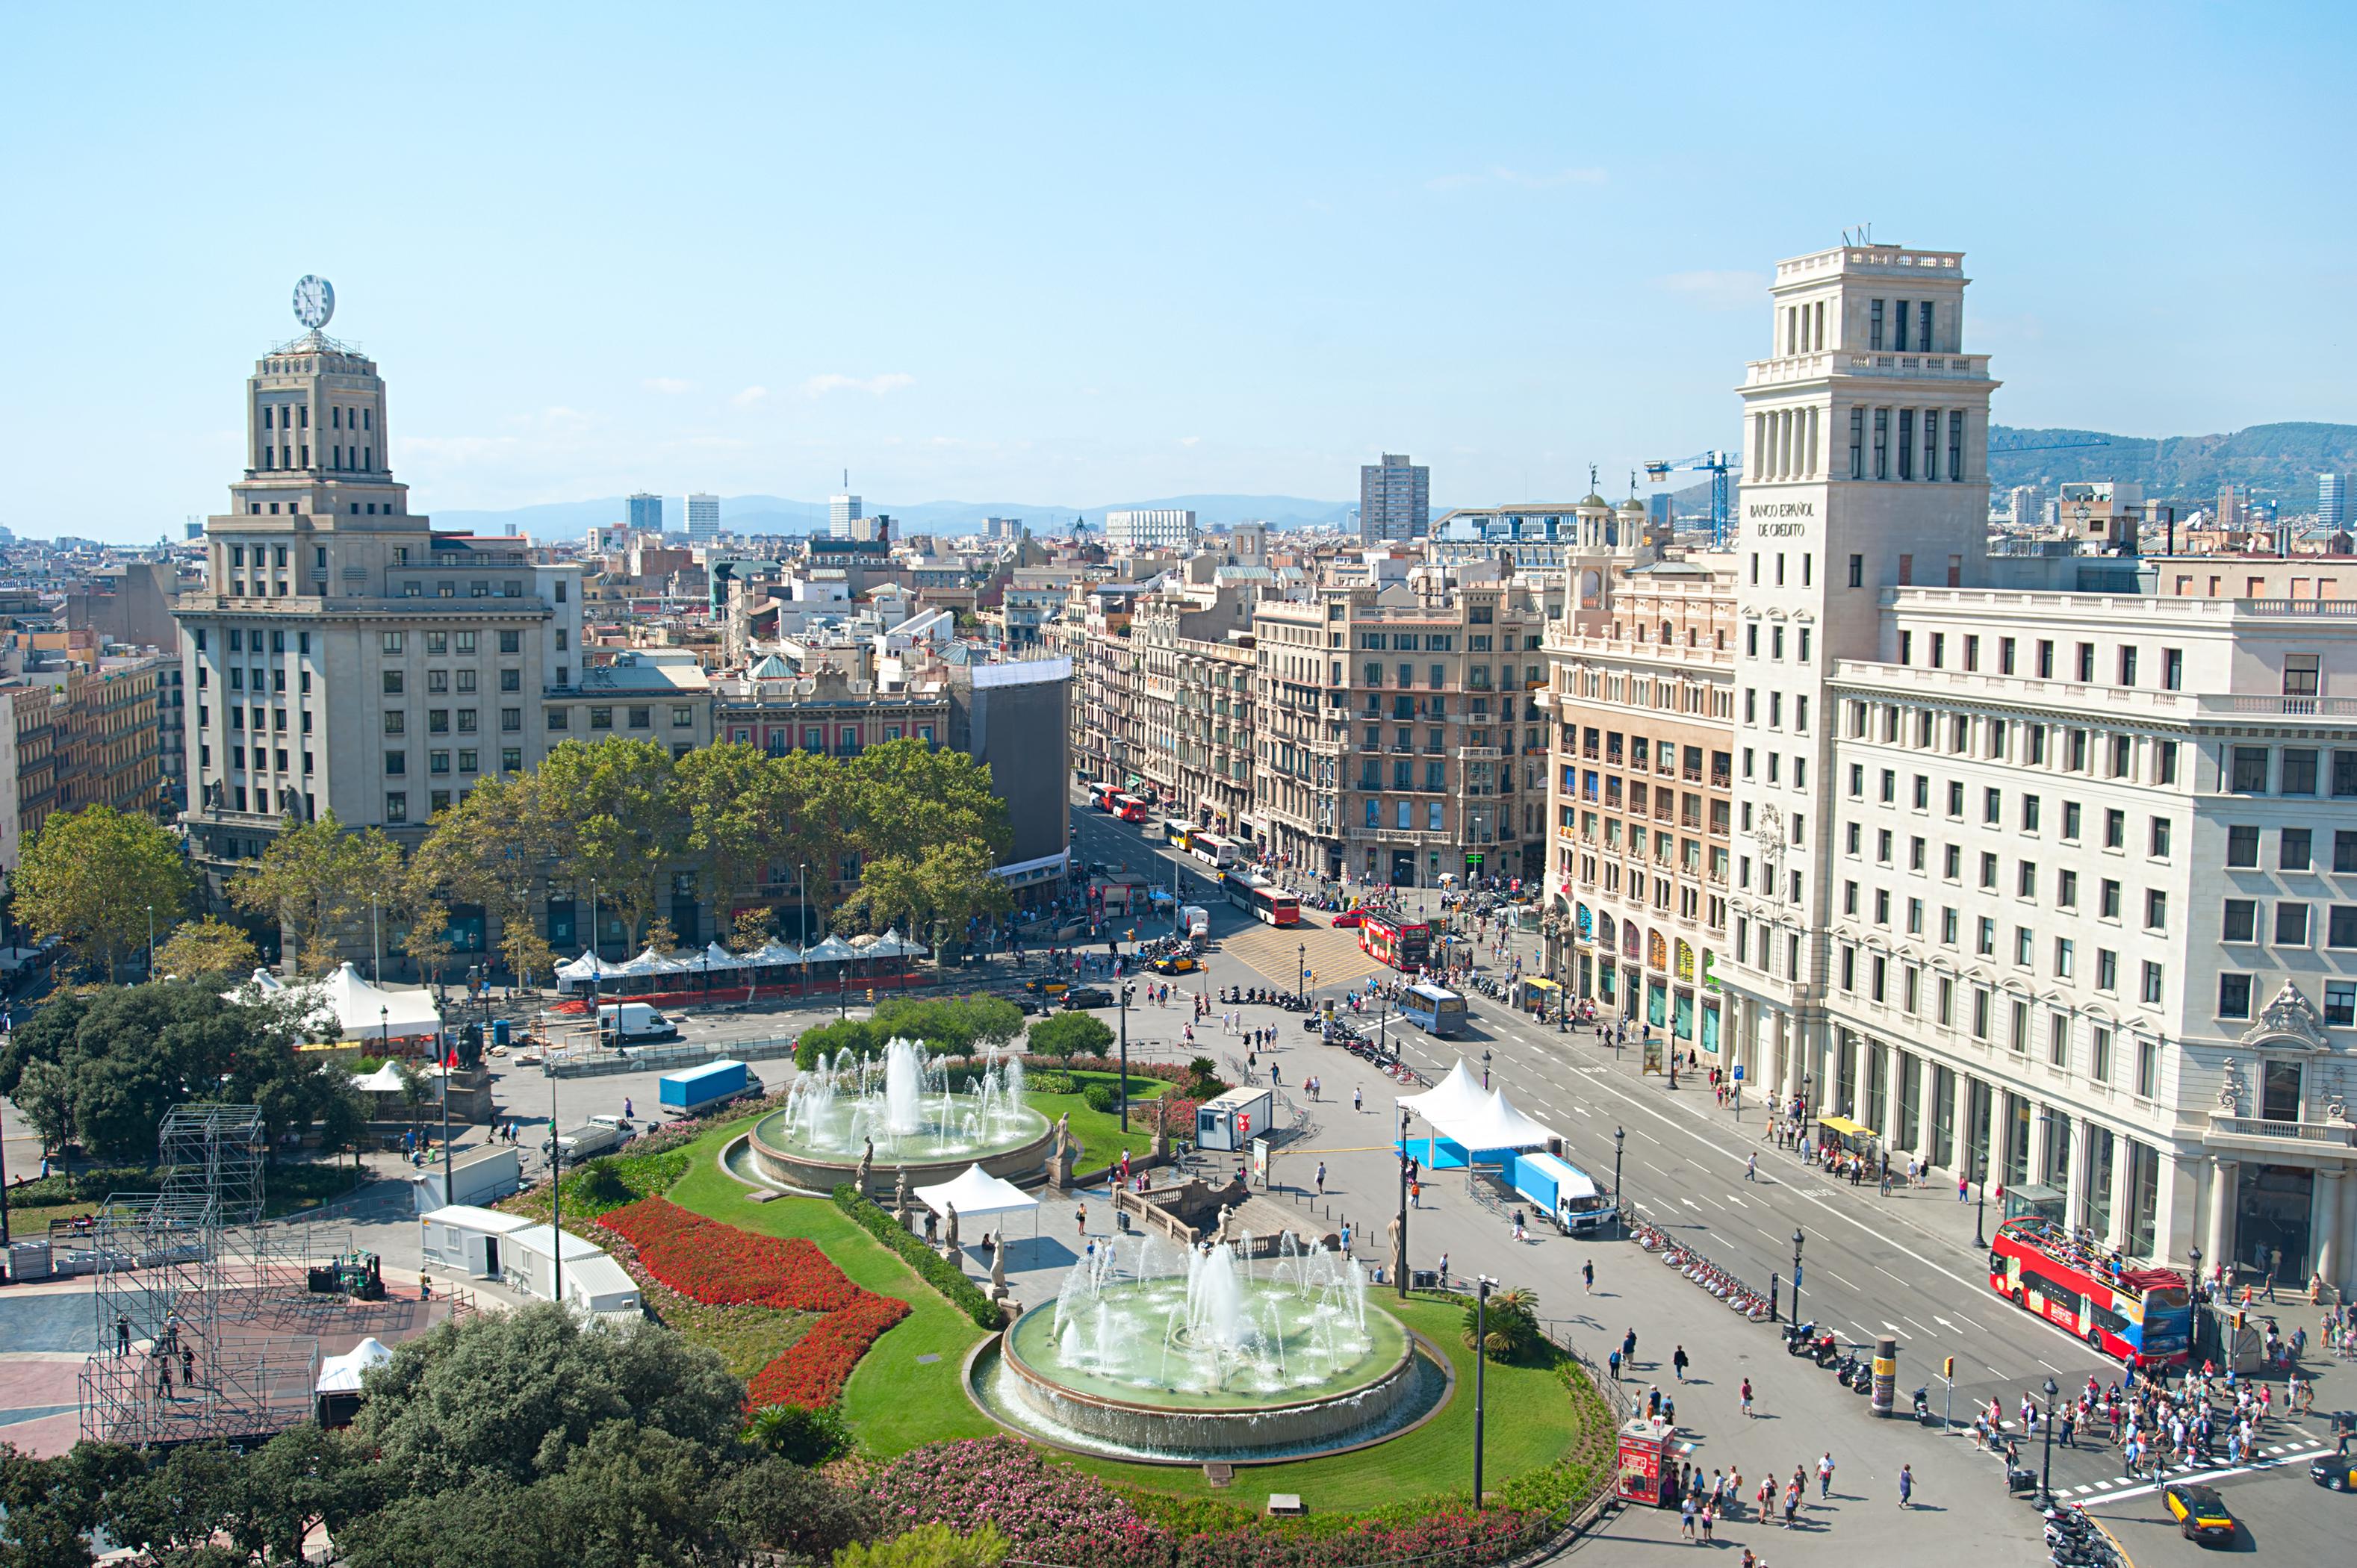 Plaza Cataluña de Barcelona 8b15a80f21d